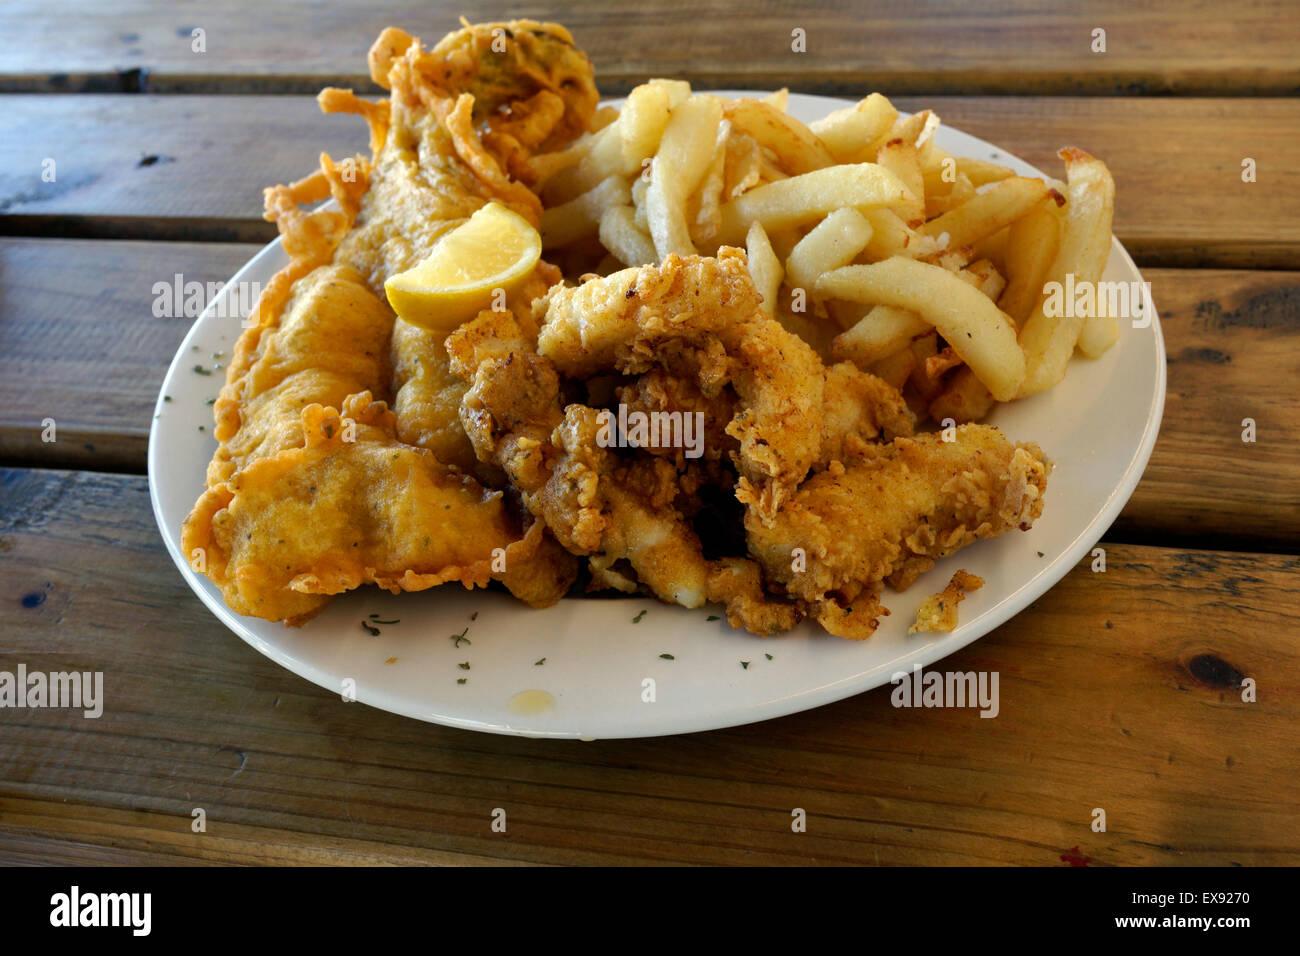 Fried fish & calamari at' Die Visvlekhuis' seafood restaurant in the coastal fishing village Velddrif - Stock Image